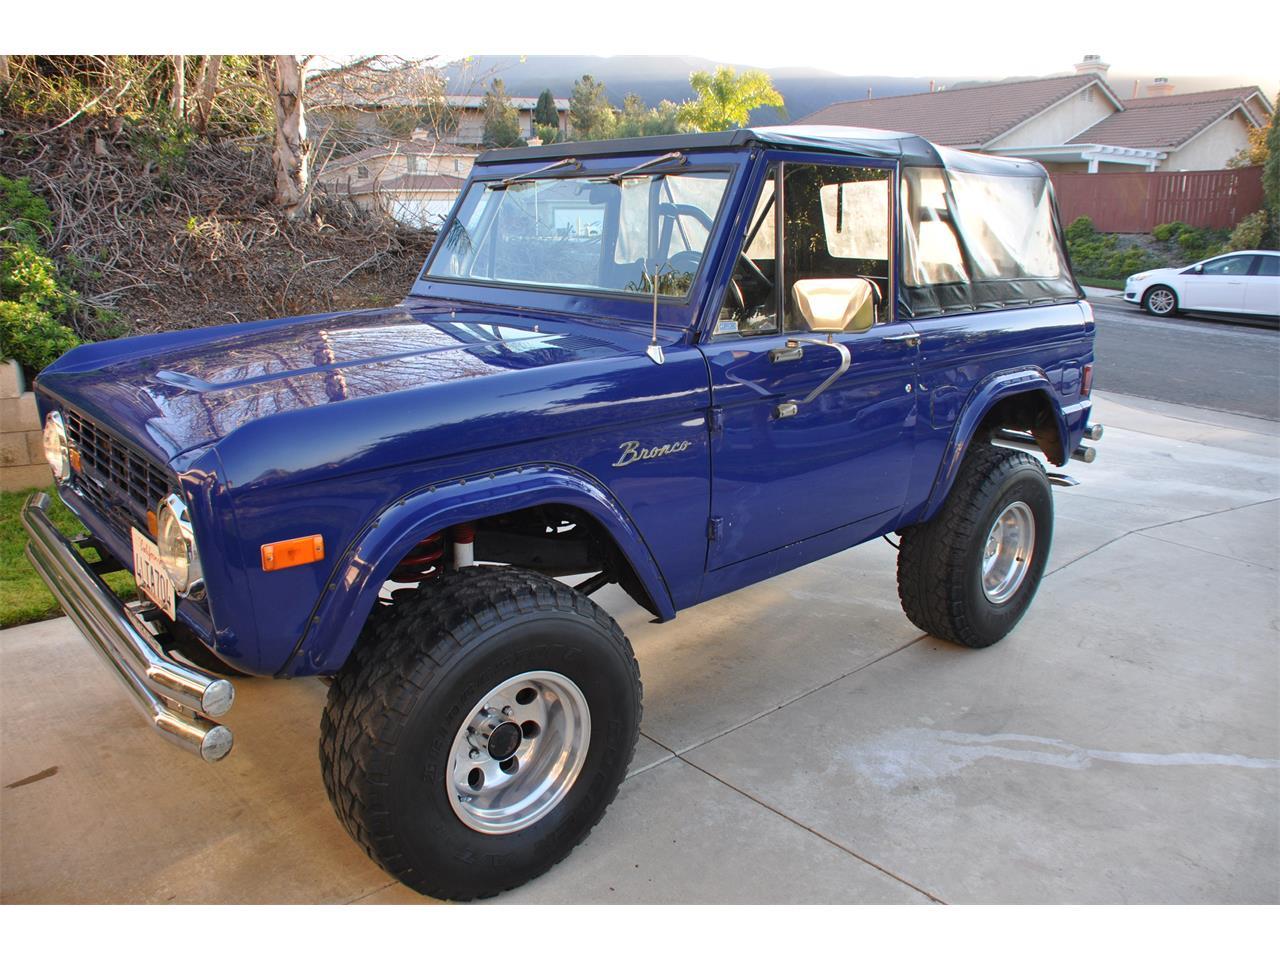 1977 Ford Bronco For Sale In Corona Ca Classiccarsbay Com